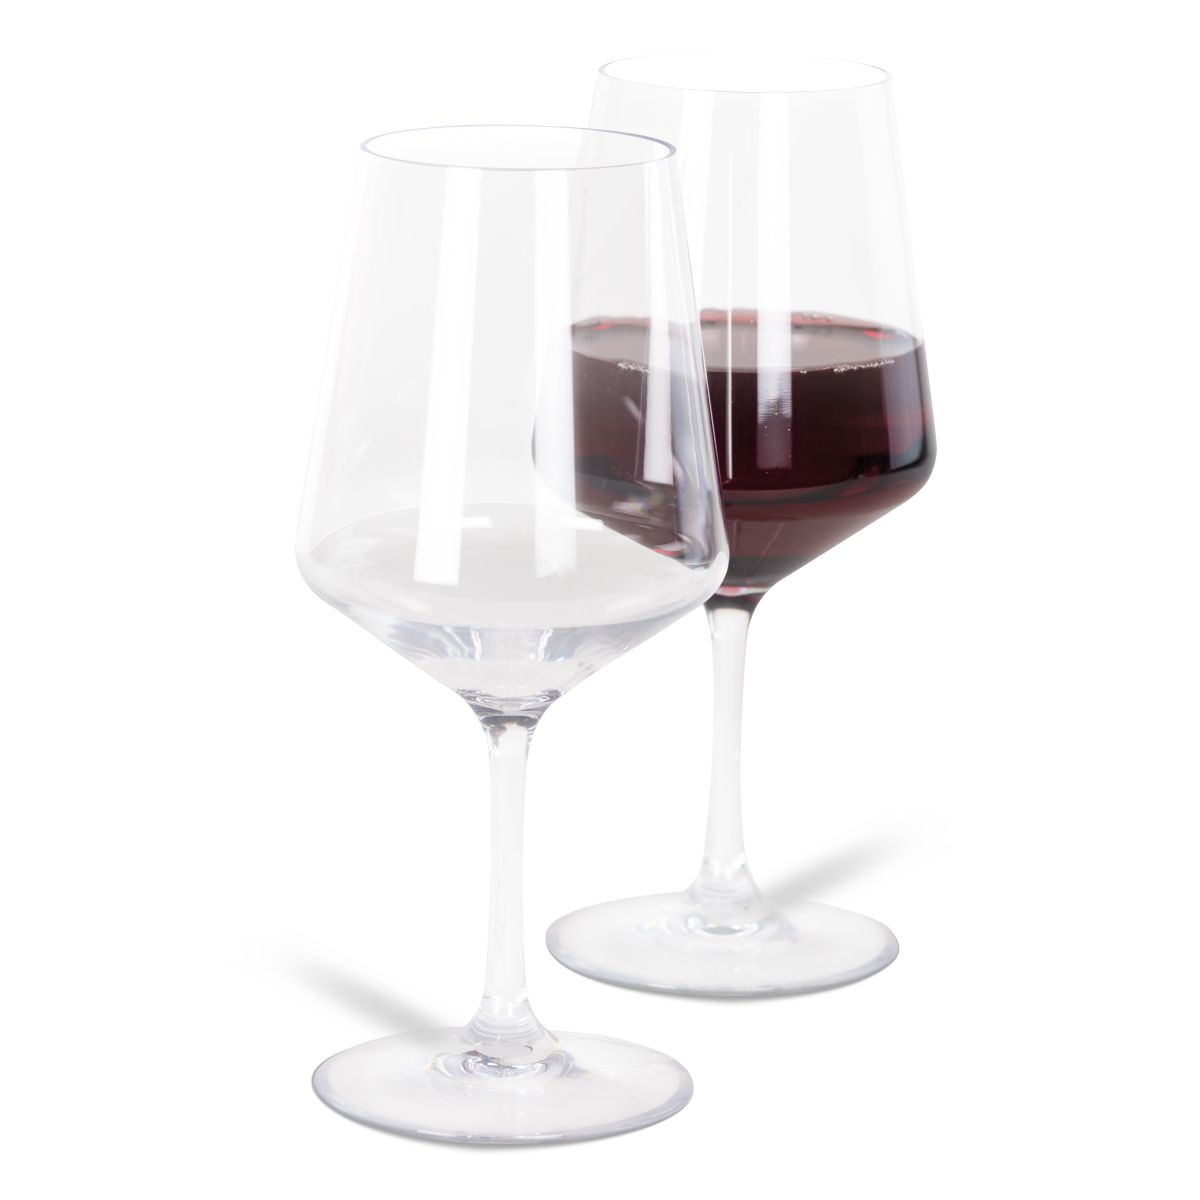 Kampa Soho Wine Glasses 570ml